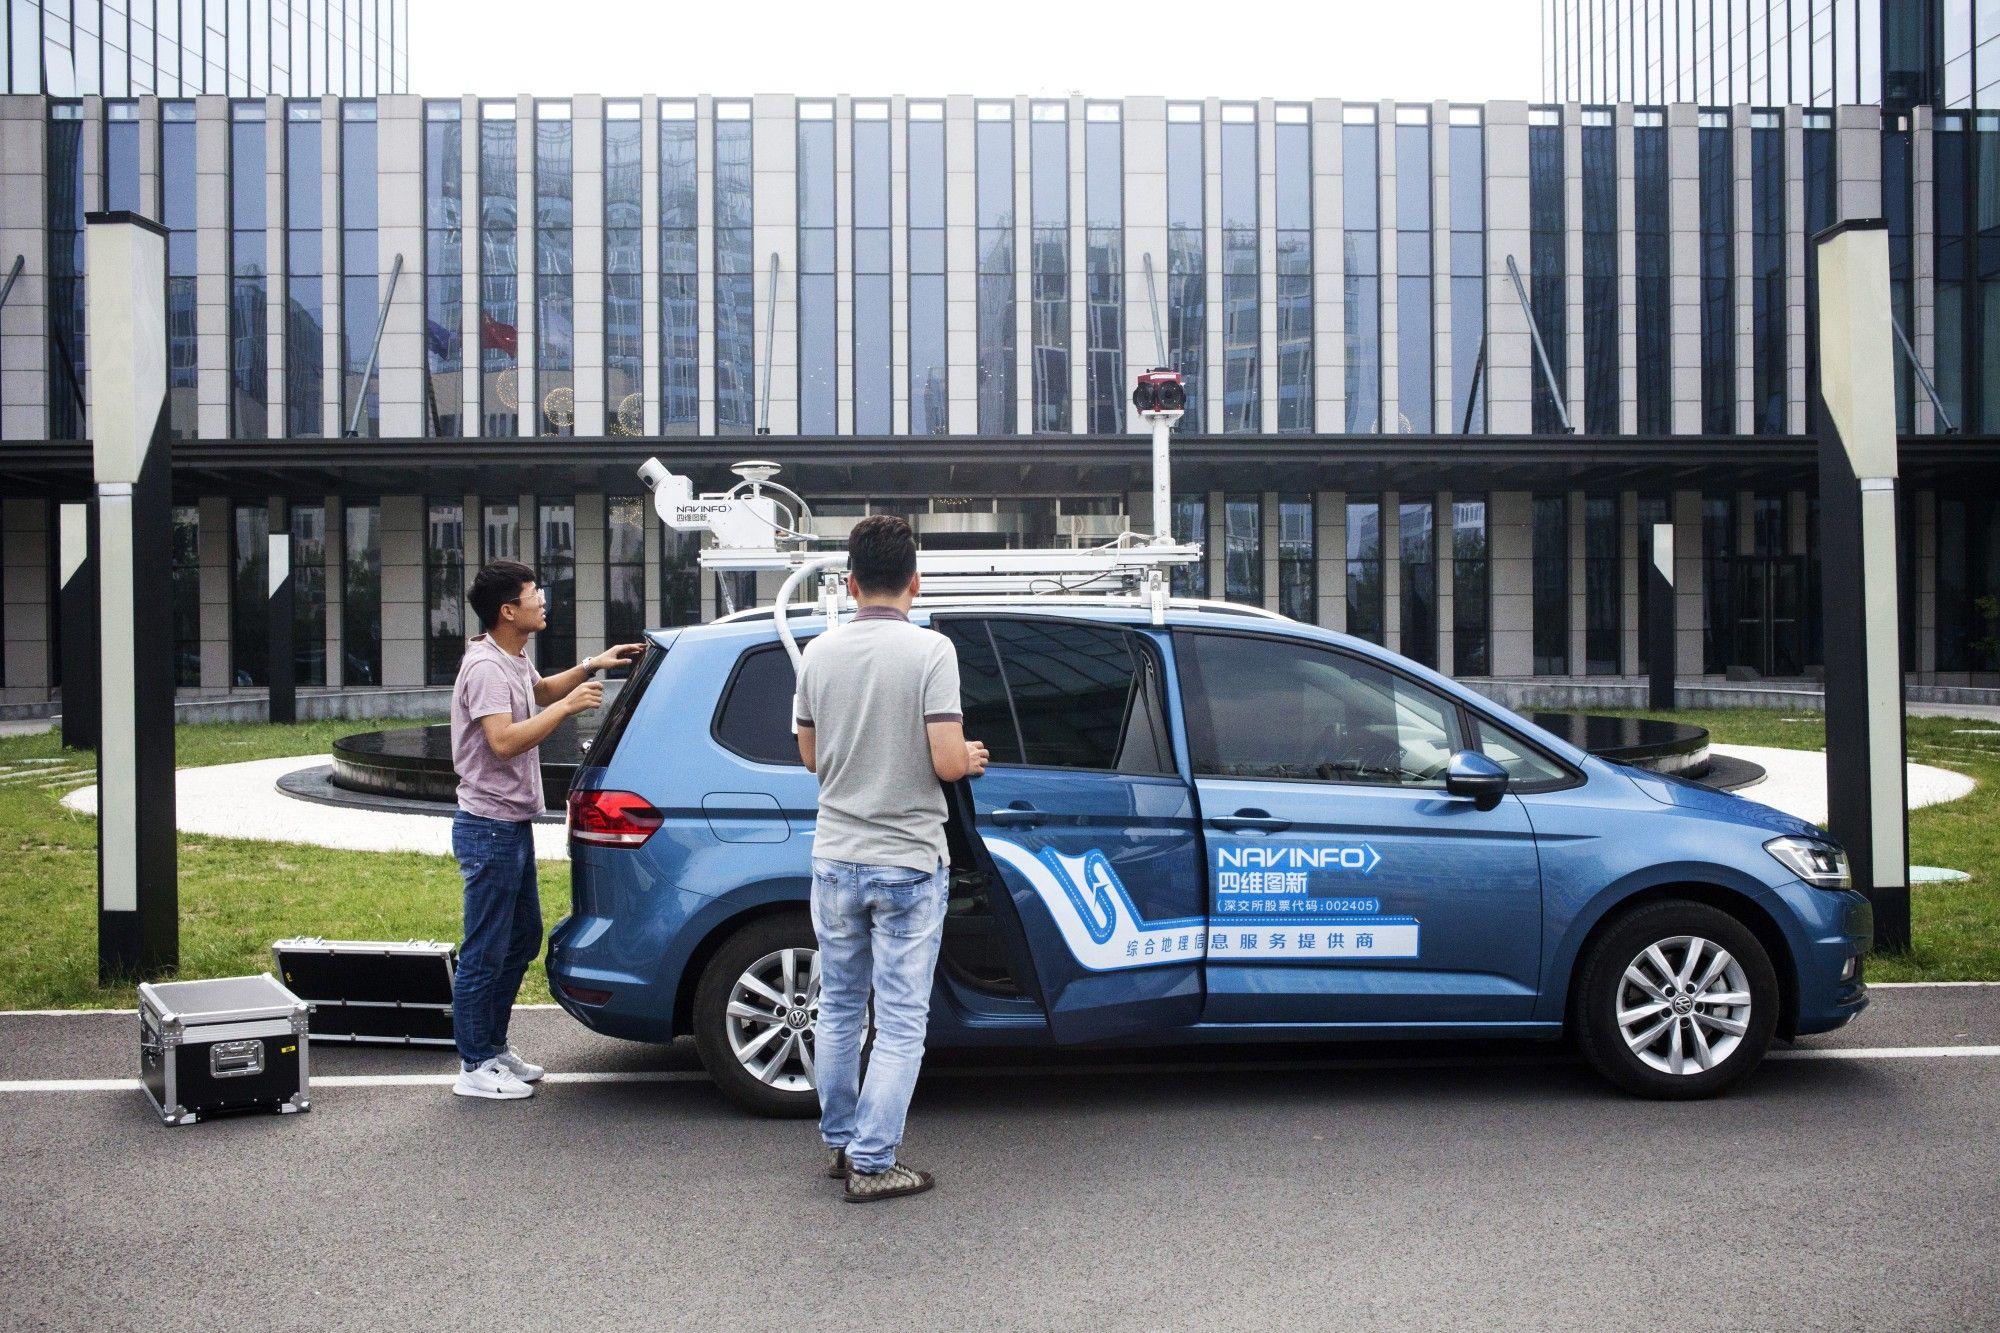 Operations at NavInfo as China Develops Next Generation of Digital Maps